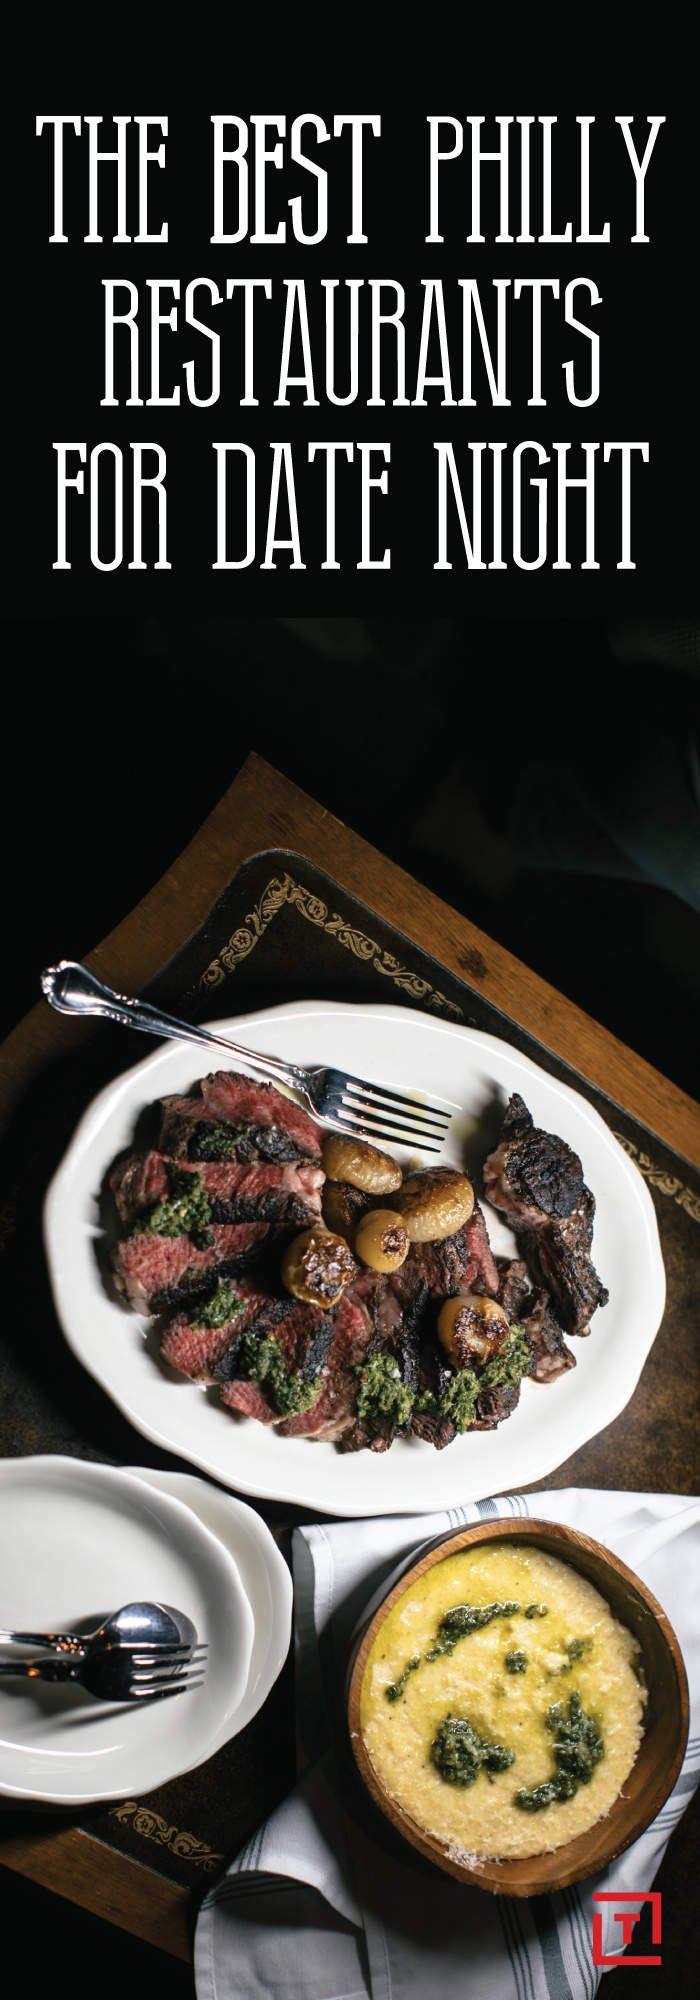 Best Philly Restaurants for Date Night